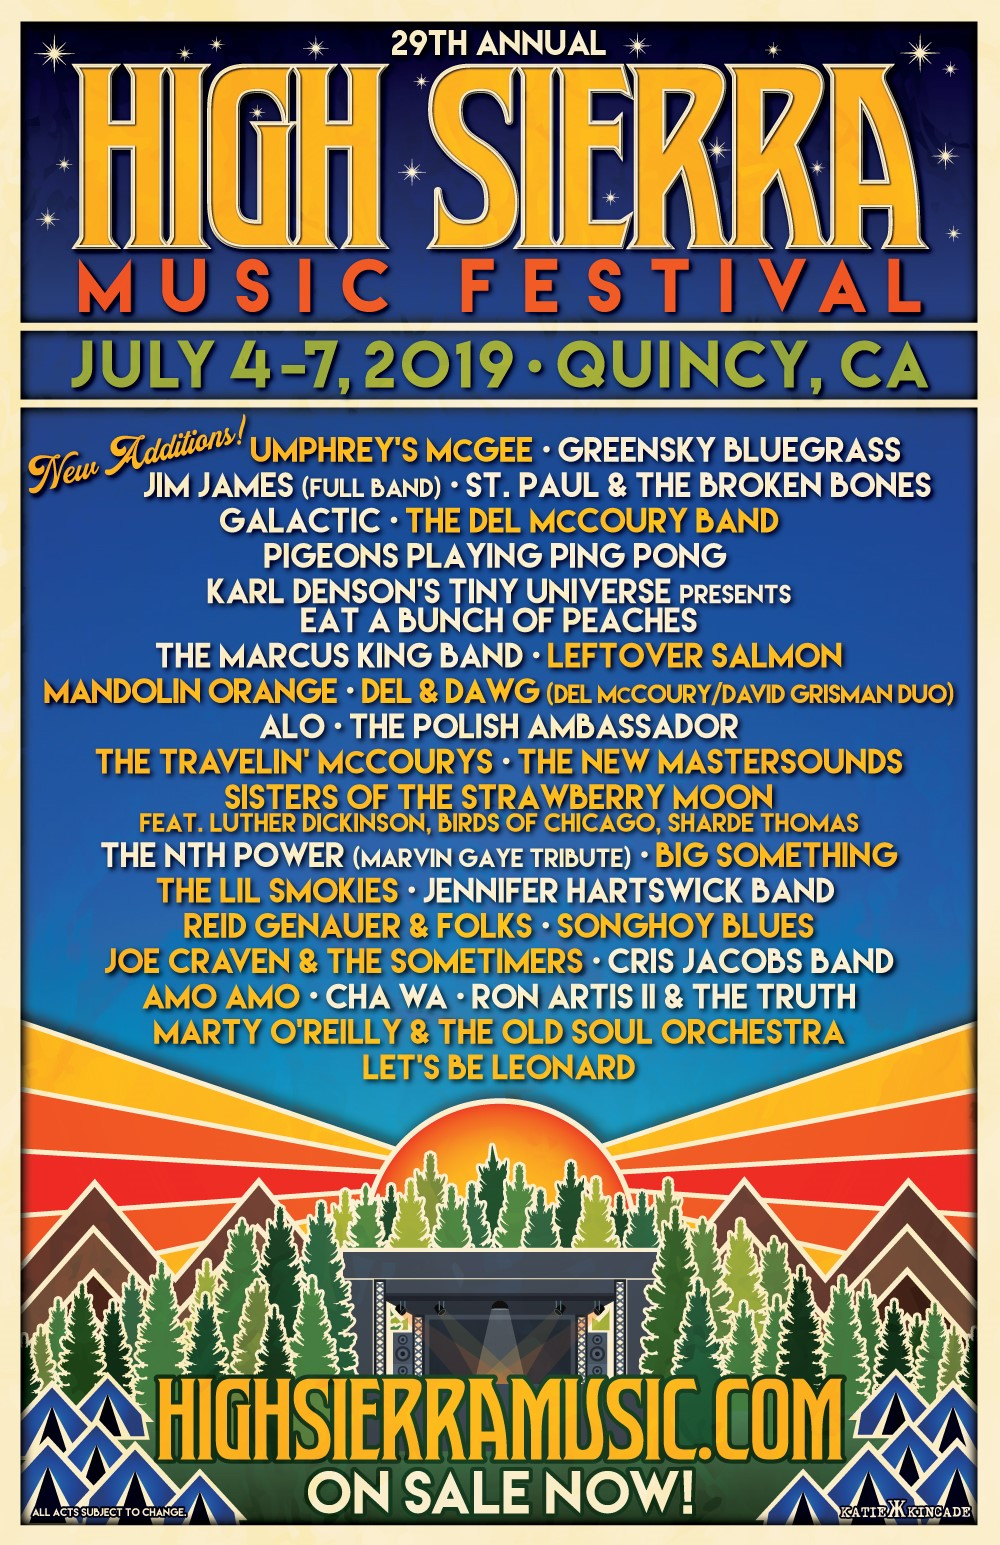 Best Picture Festival 2019 The Best Music Festival Lineups of 2019 • MUSICFESTNEWS